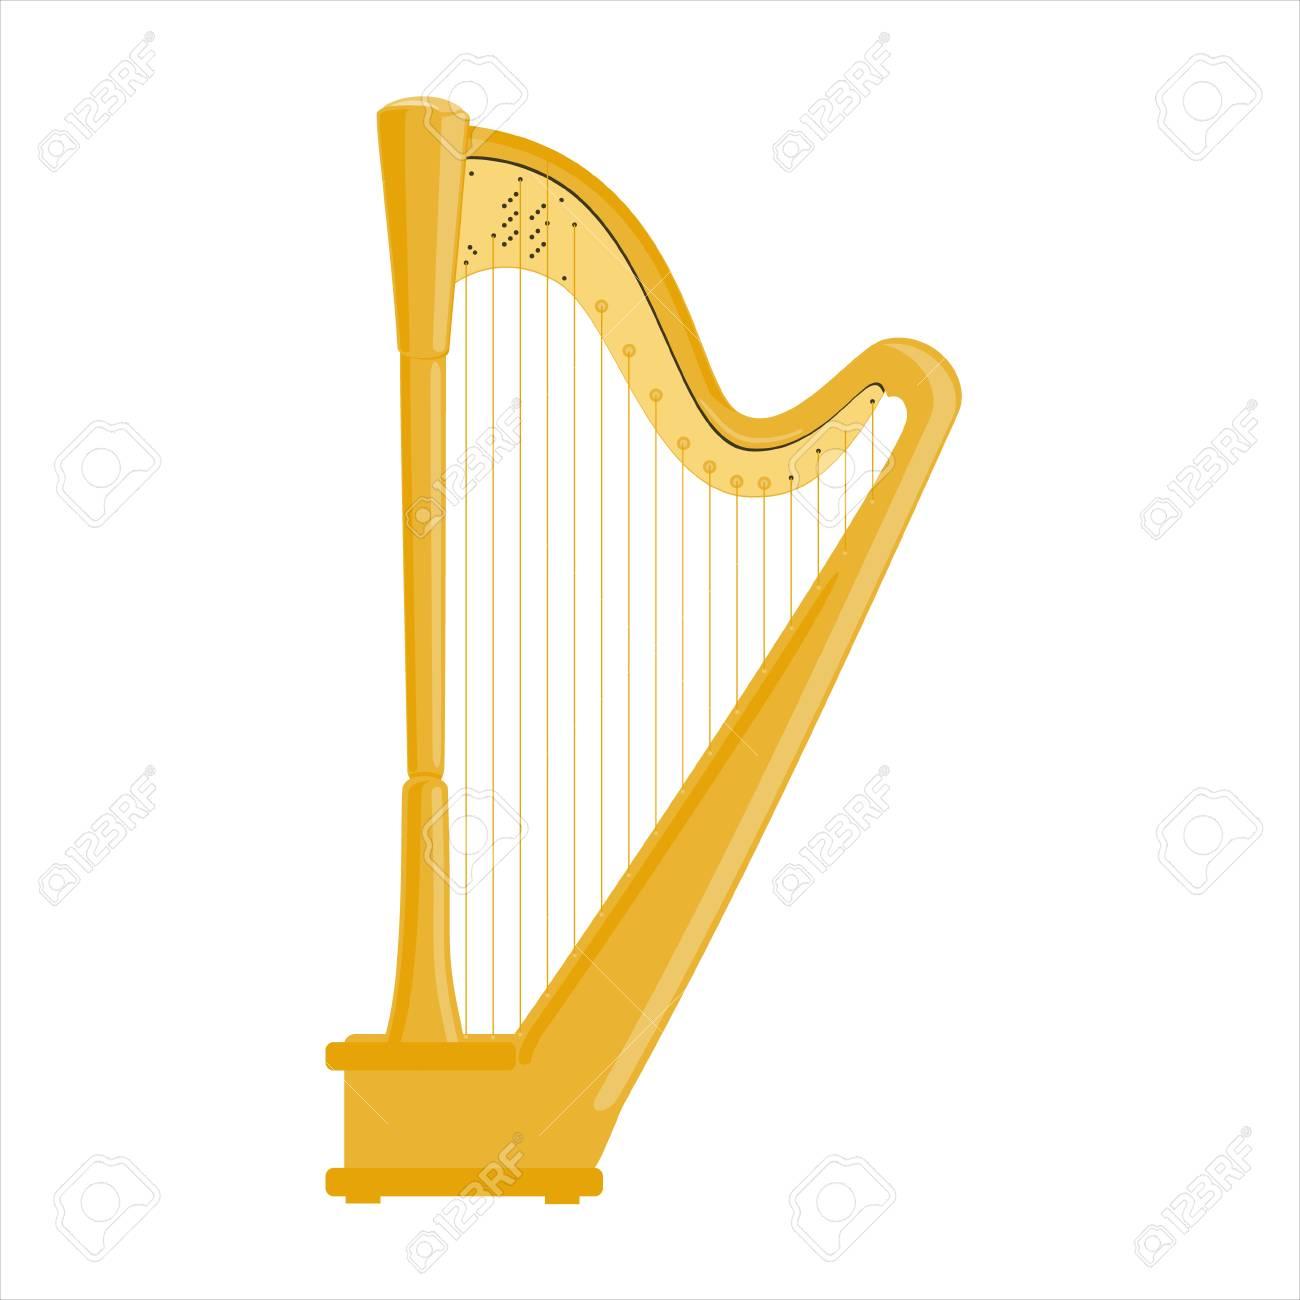 Raster illustration classical music instrumet. Pedal harp isolated on white background. - 94138158